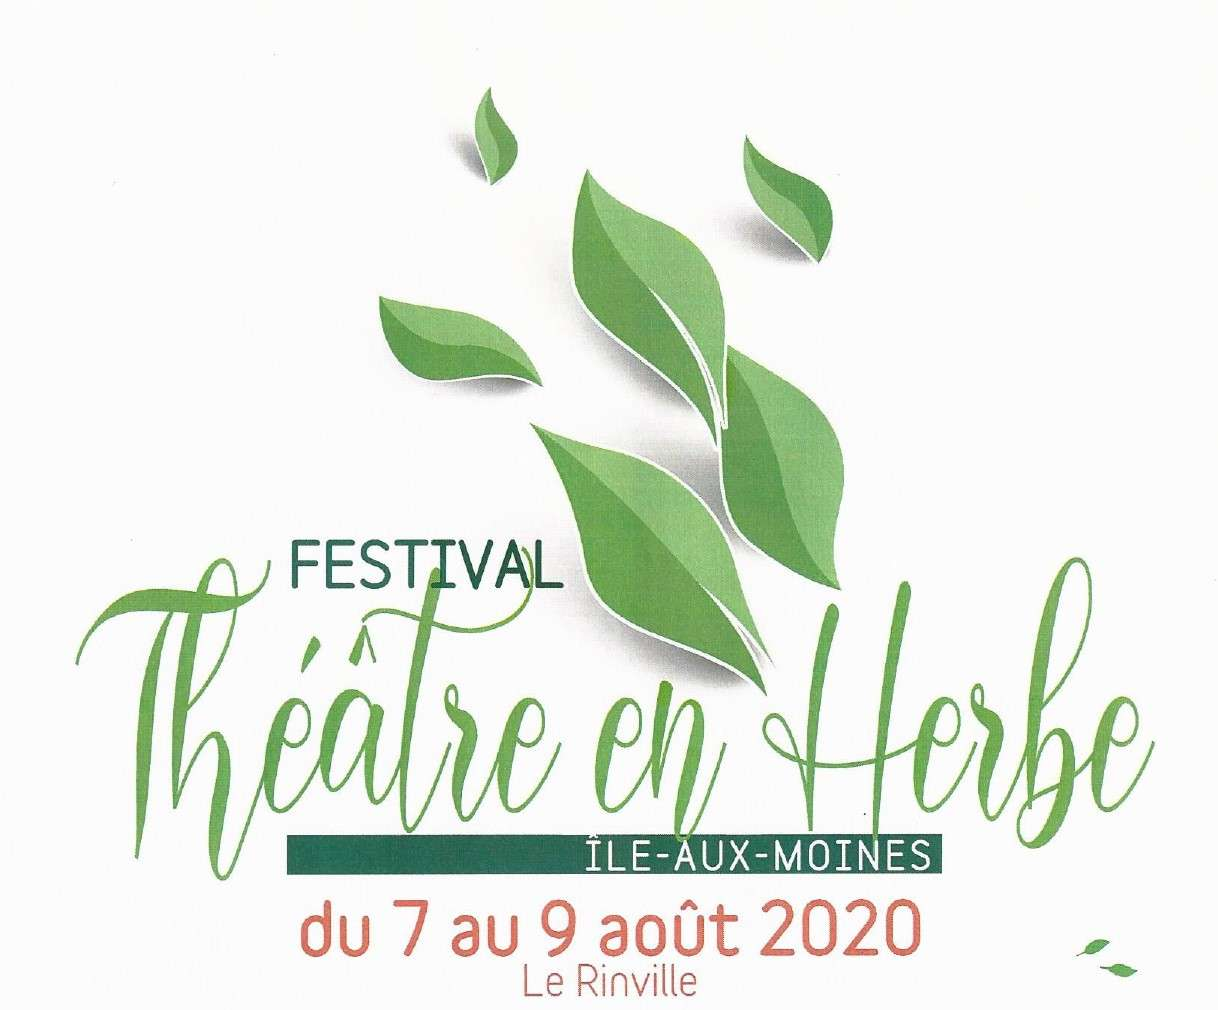 1_Festival Théâtre en Herbe